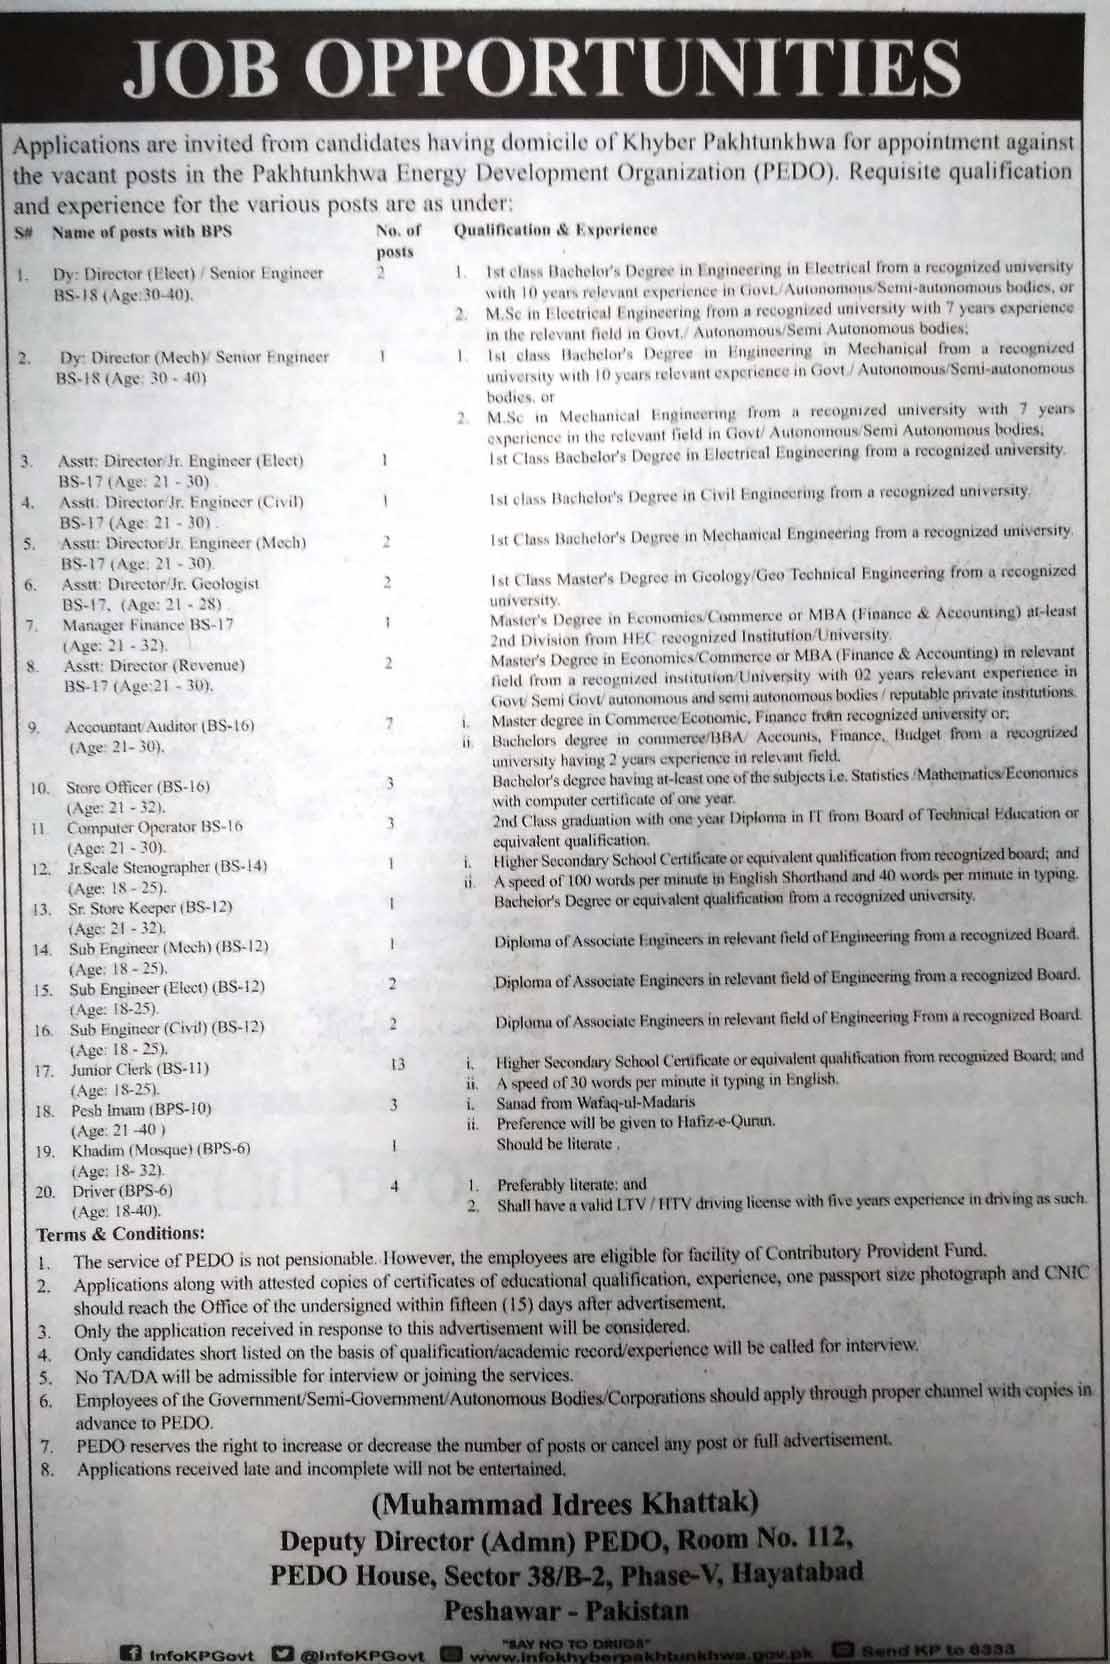 FTS Jobs inPakhtunkhwa Energy Development Organization (Regular Posts)